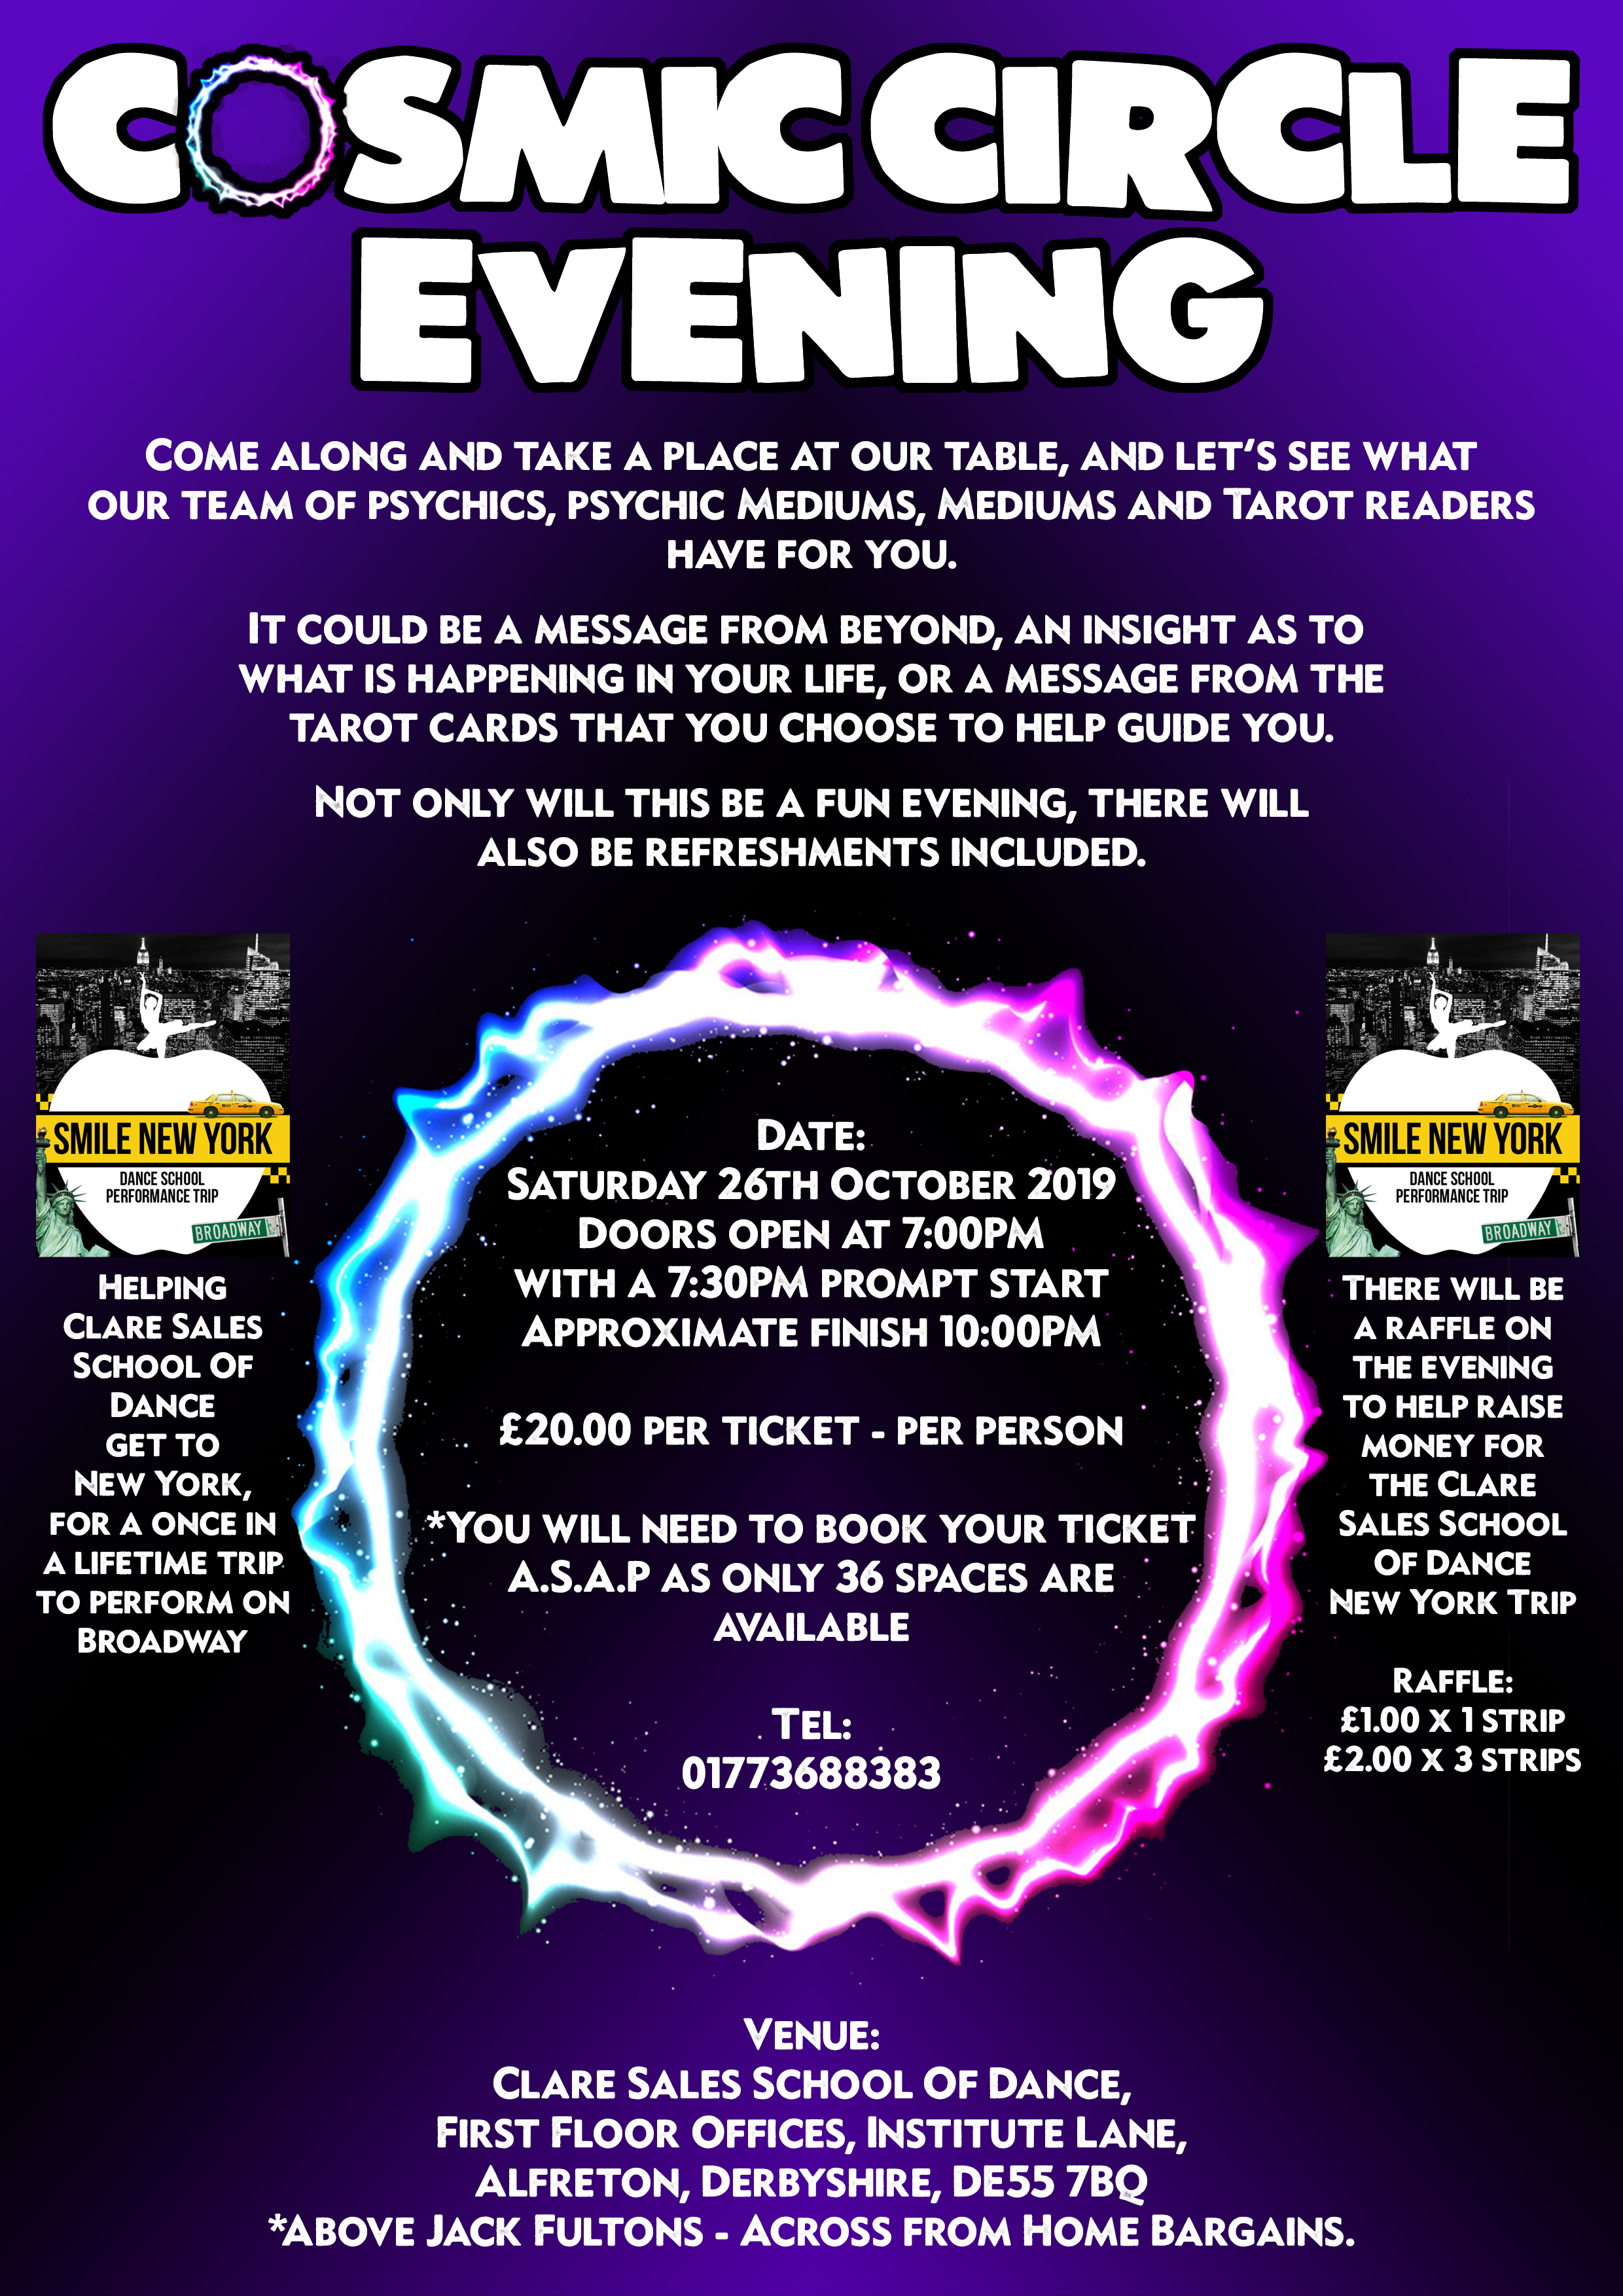 Cosmic Circle Evening